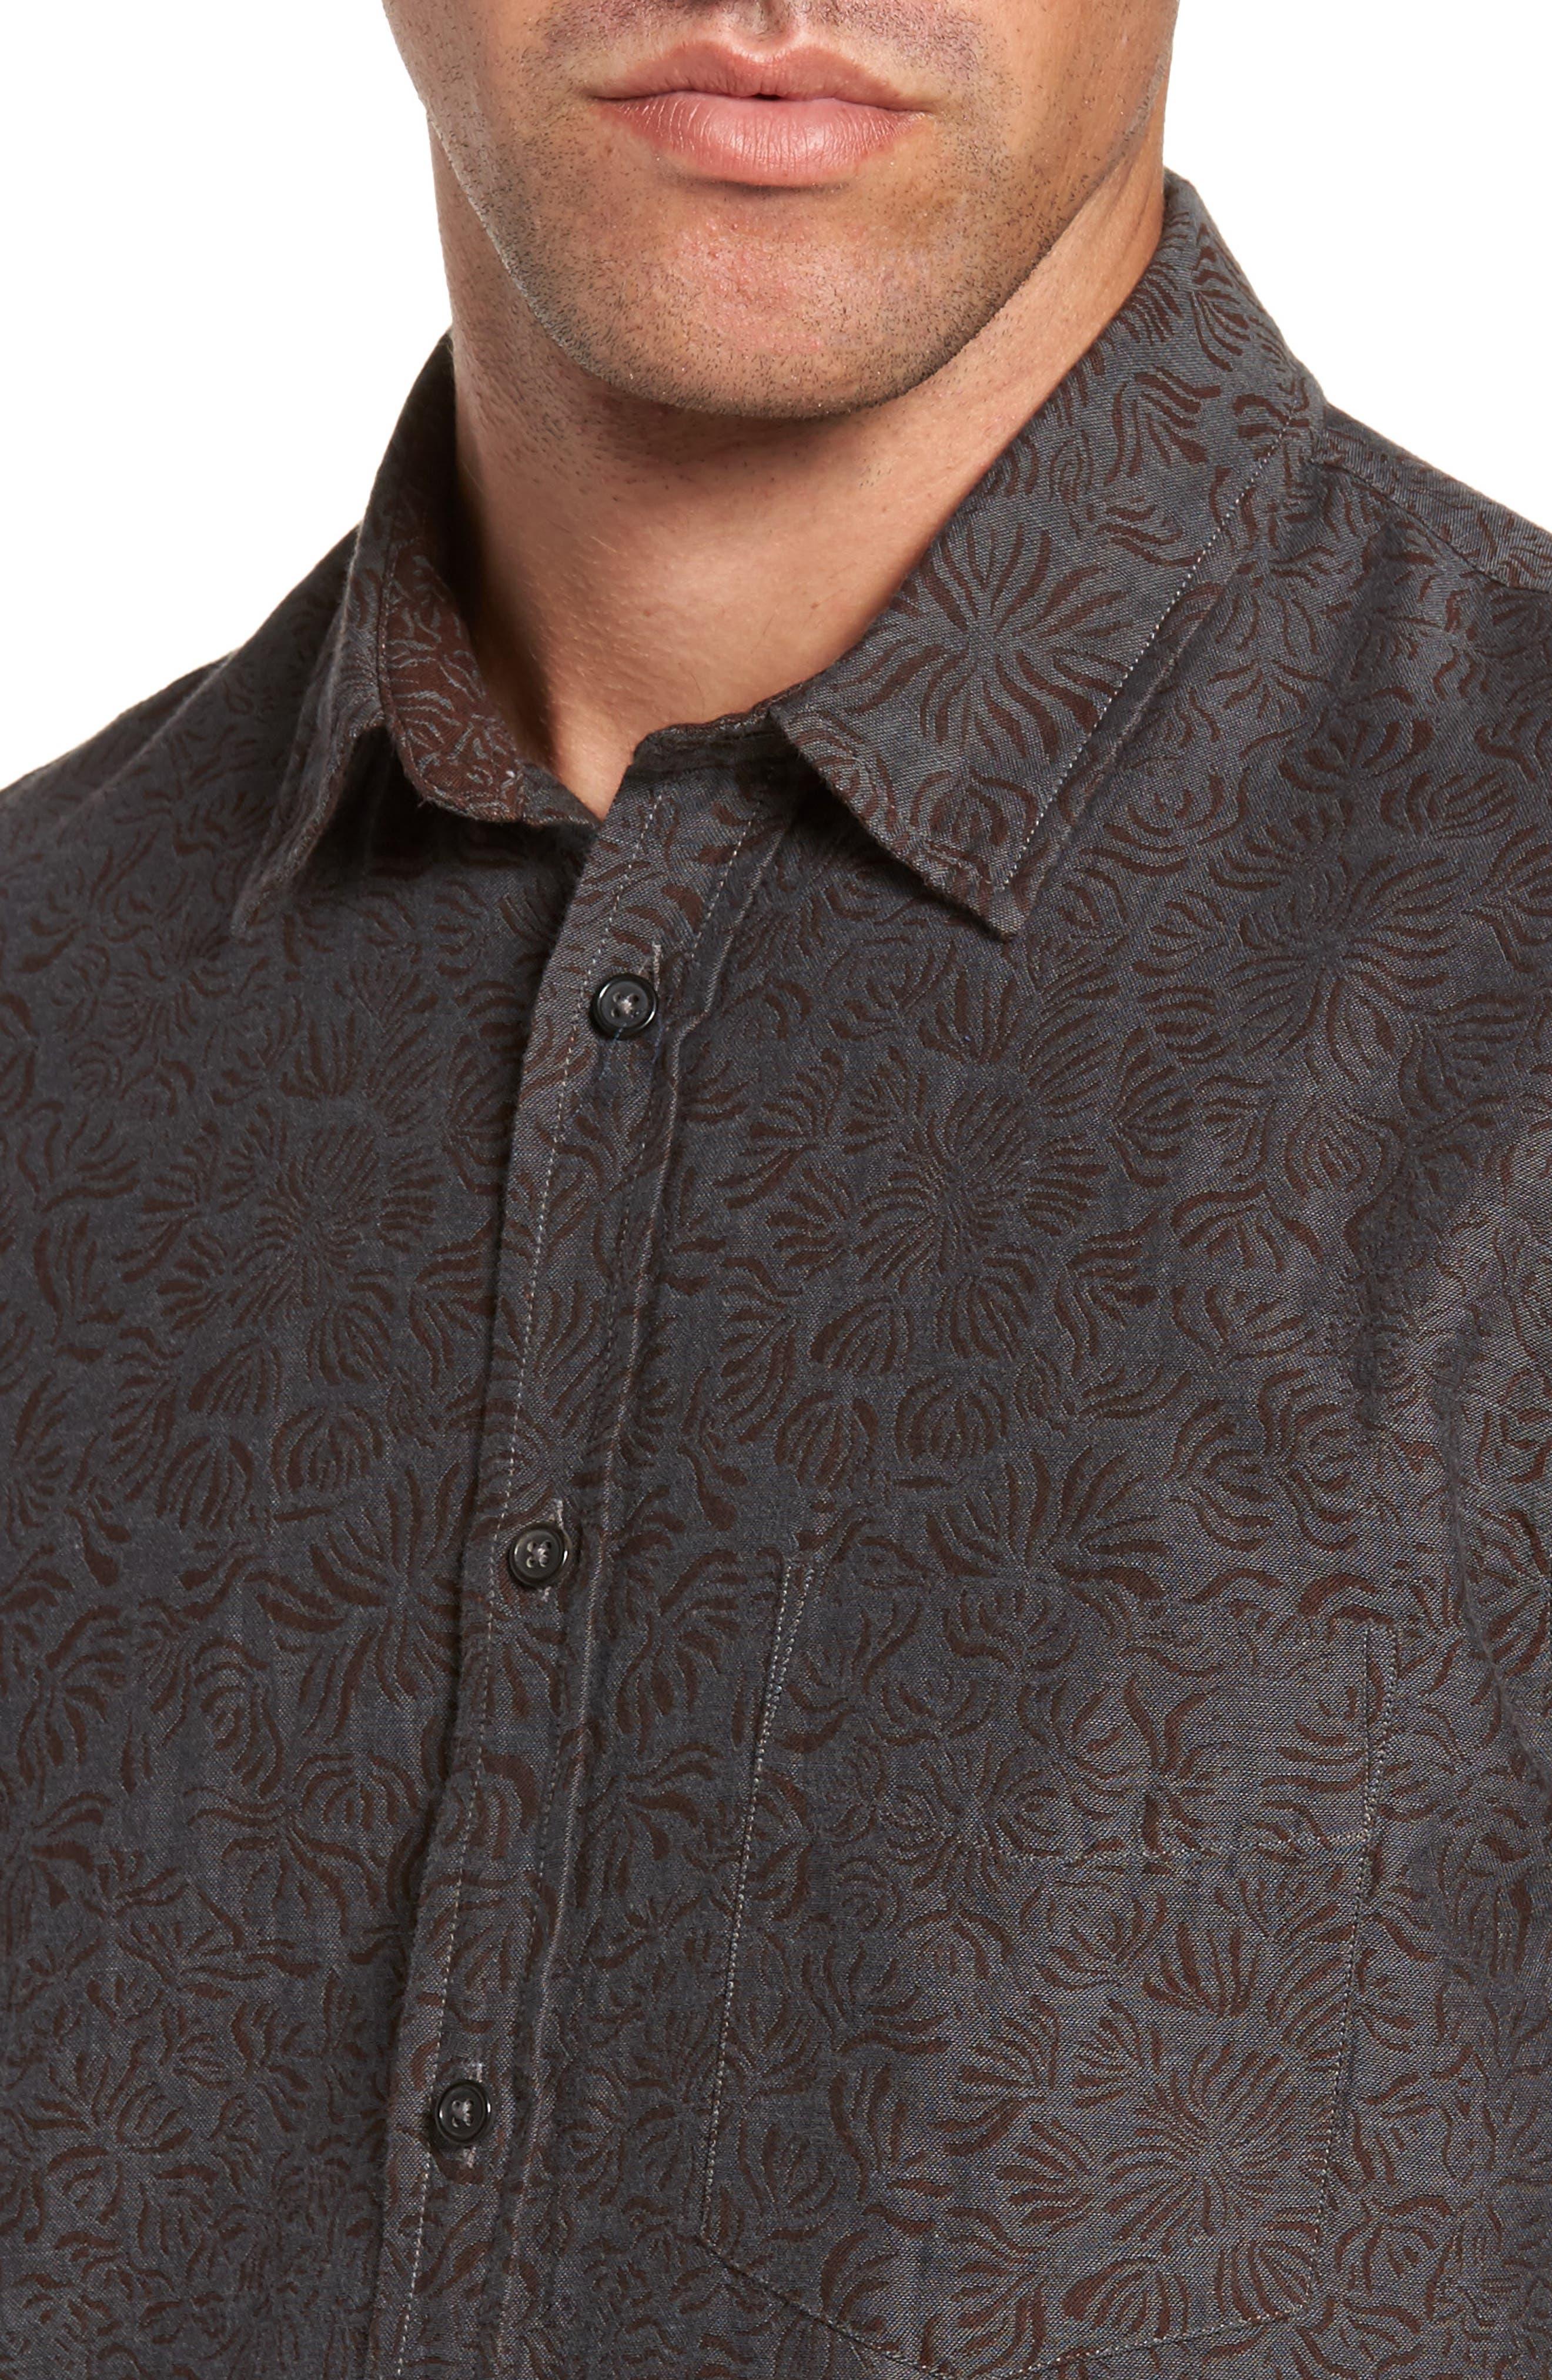 Kirby Slim Fit Jacquard Sport Shirt,                             Alternate thumbnail 4, color,                             Charcoal/ Burgundy